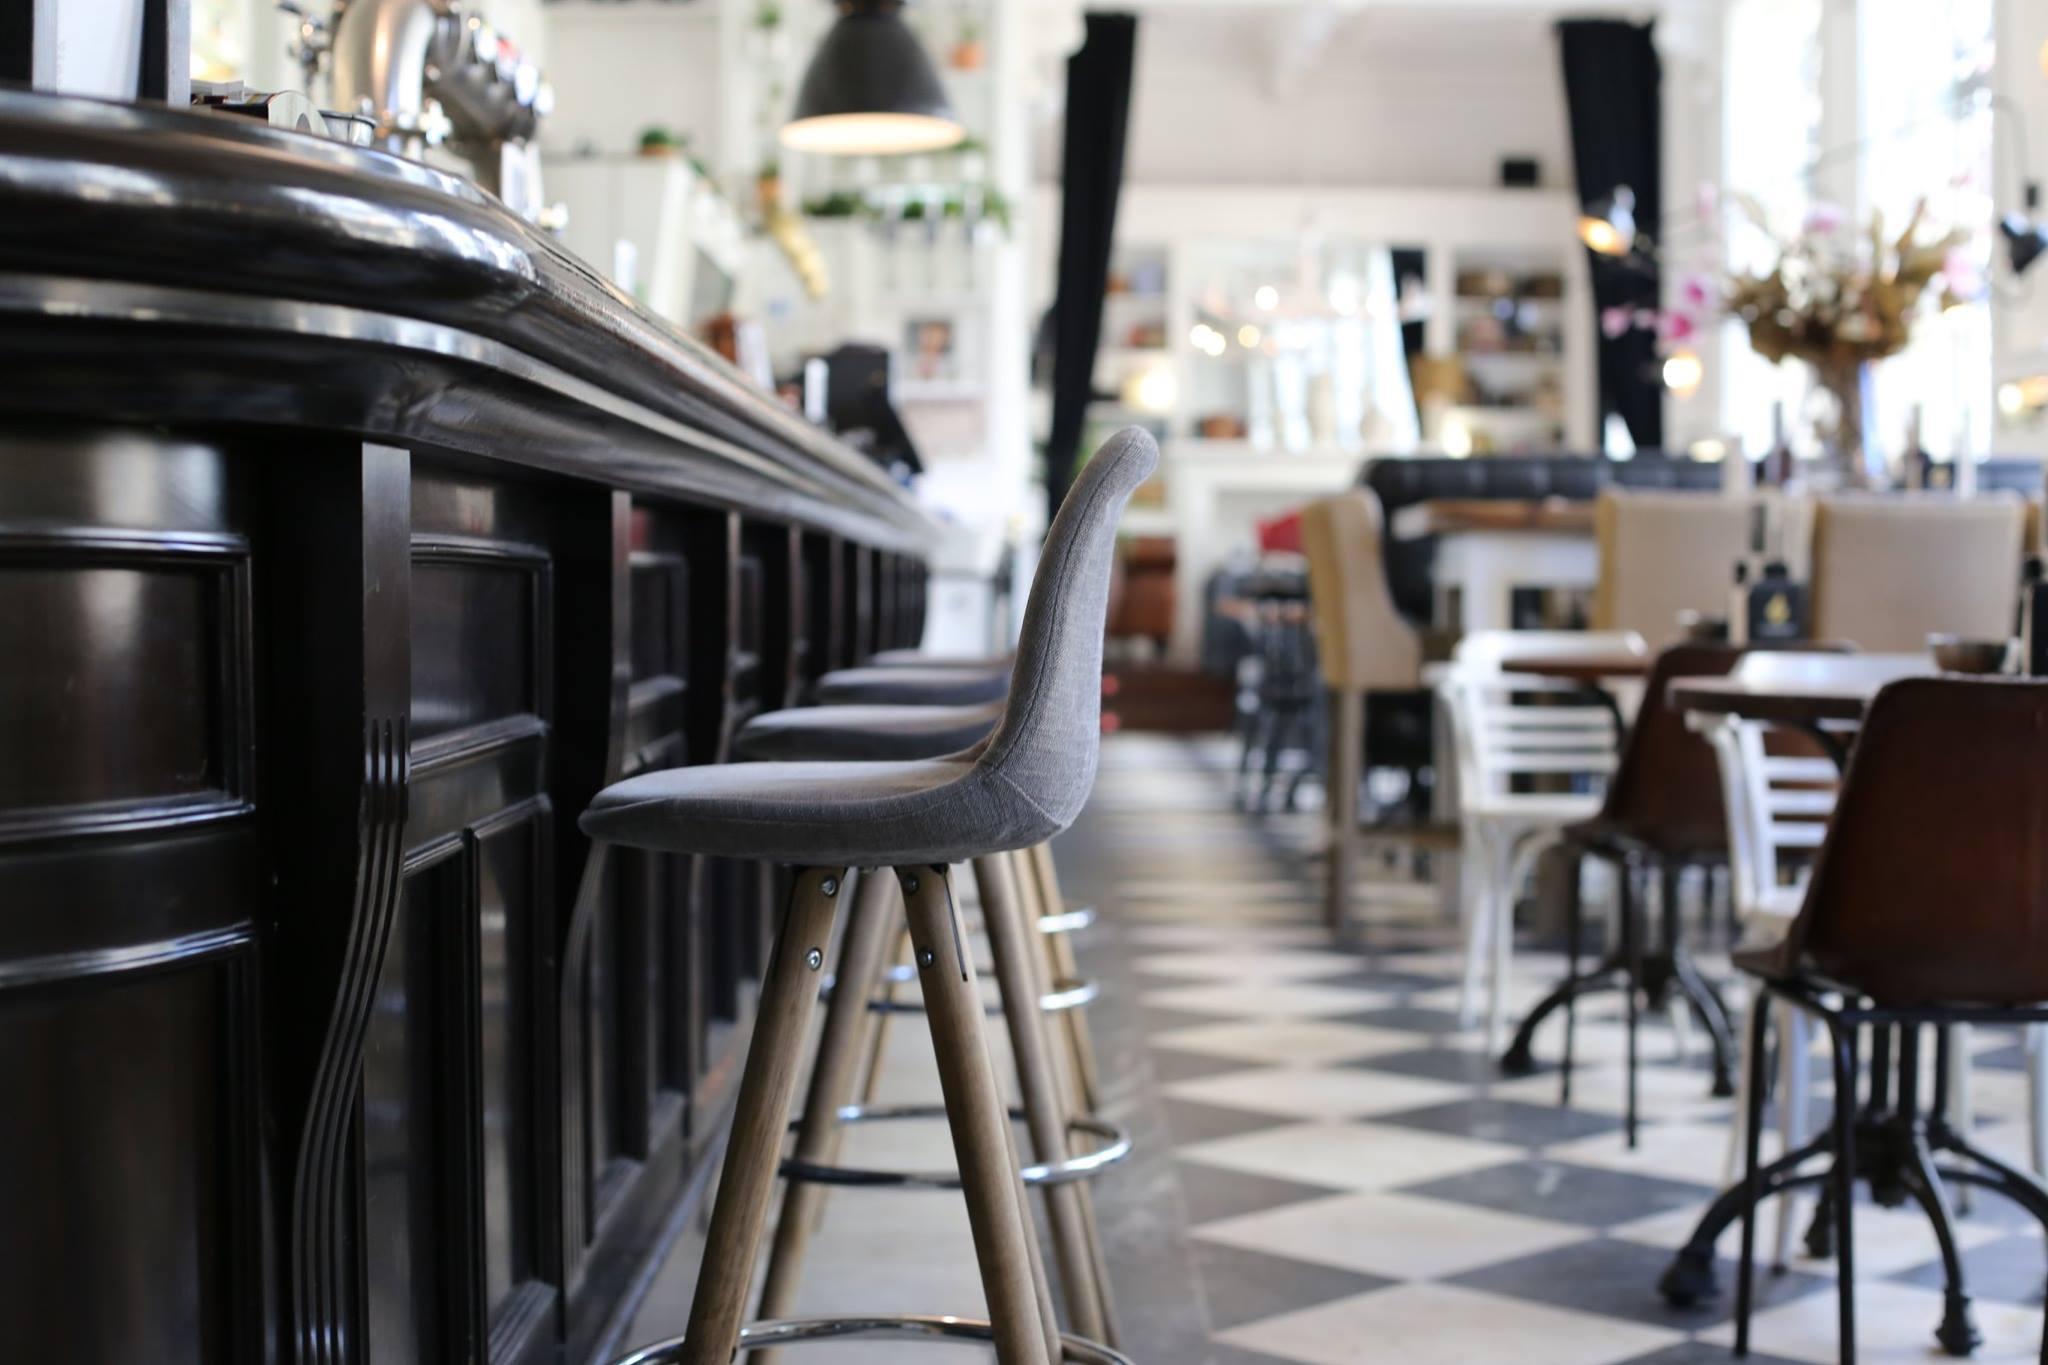 Bla Bla Café